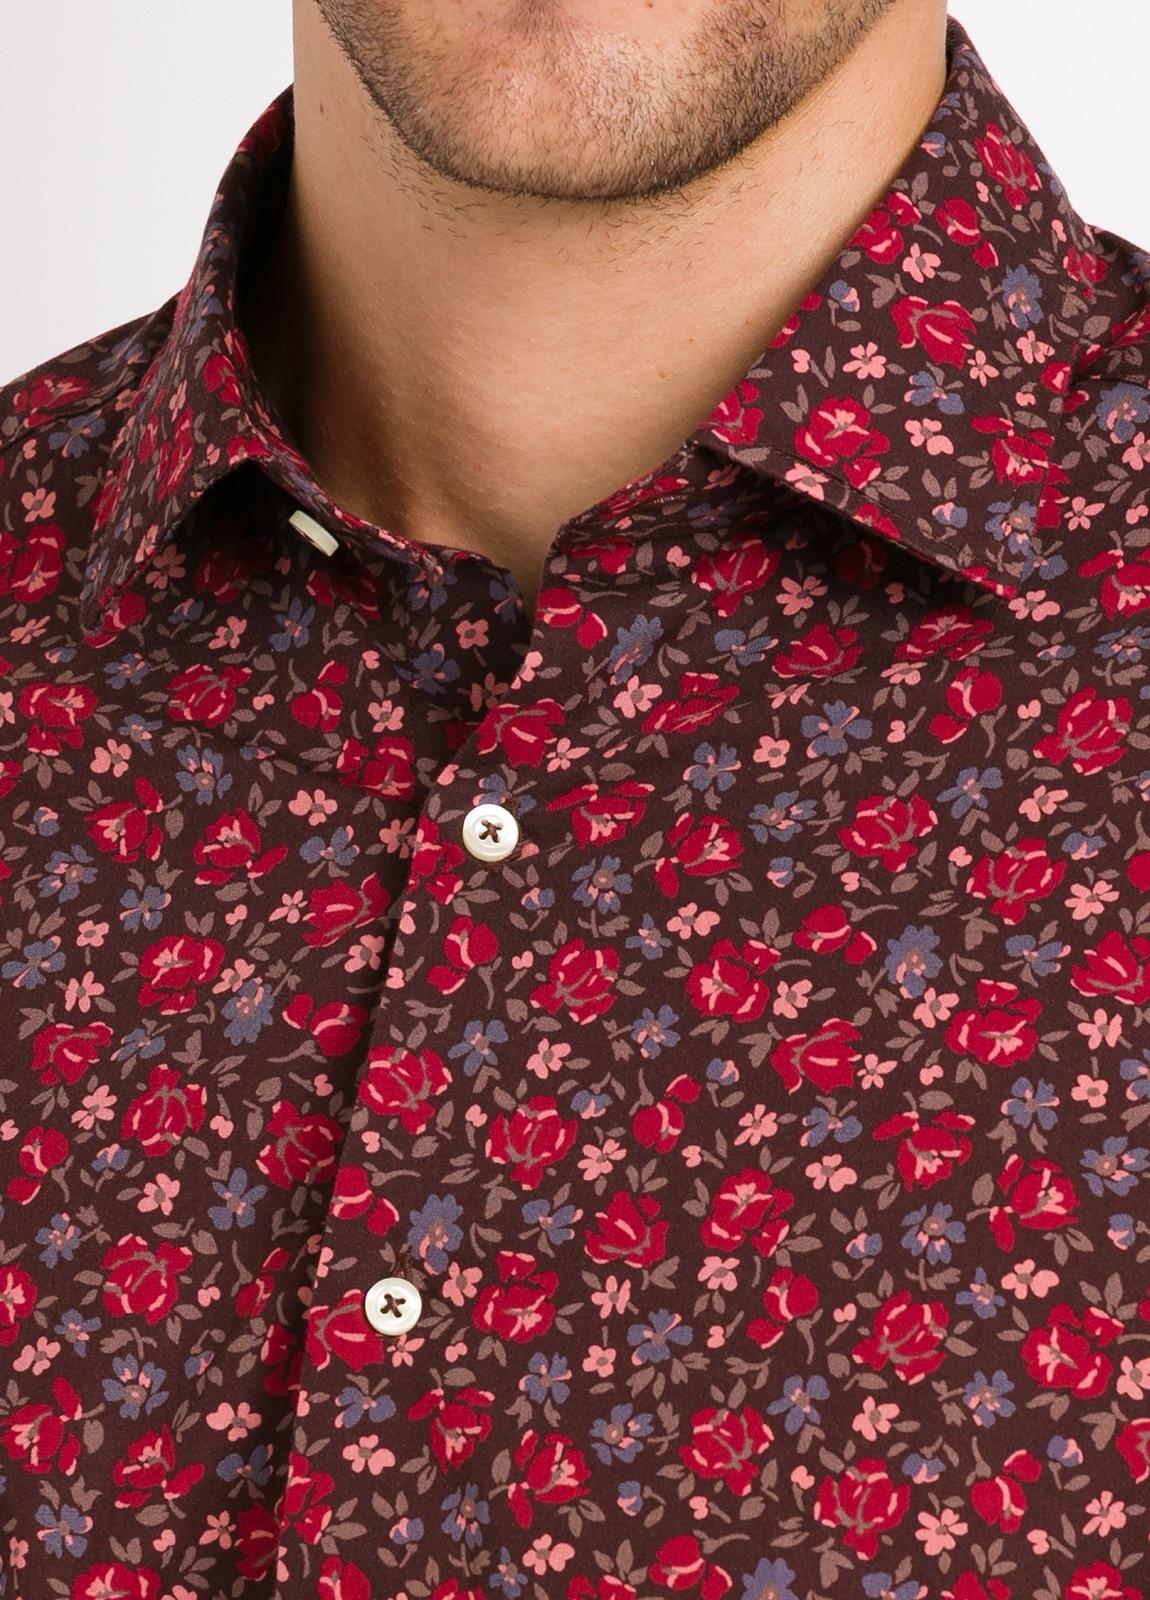 Camisa Leisure Wear SLIM FIT modelo PORTO estampado flores color granate. 100% Algodón. - Ítem1